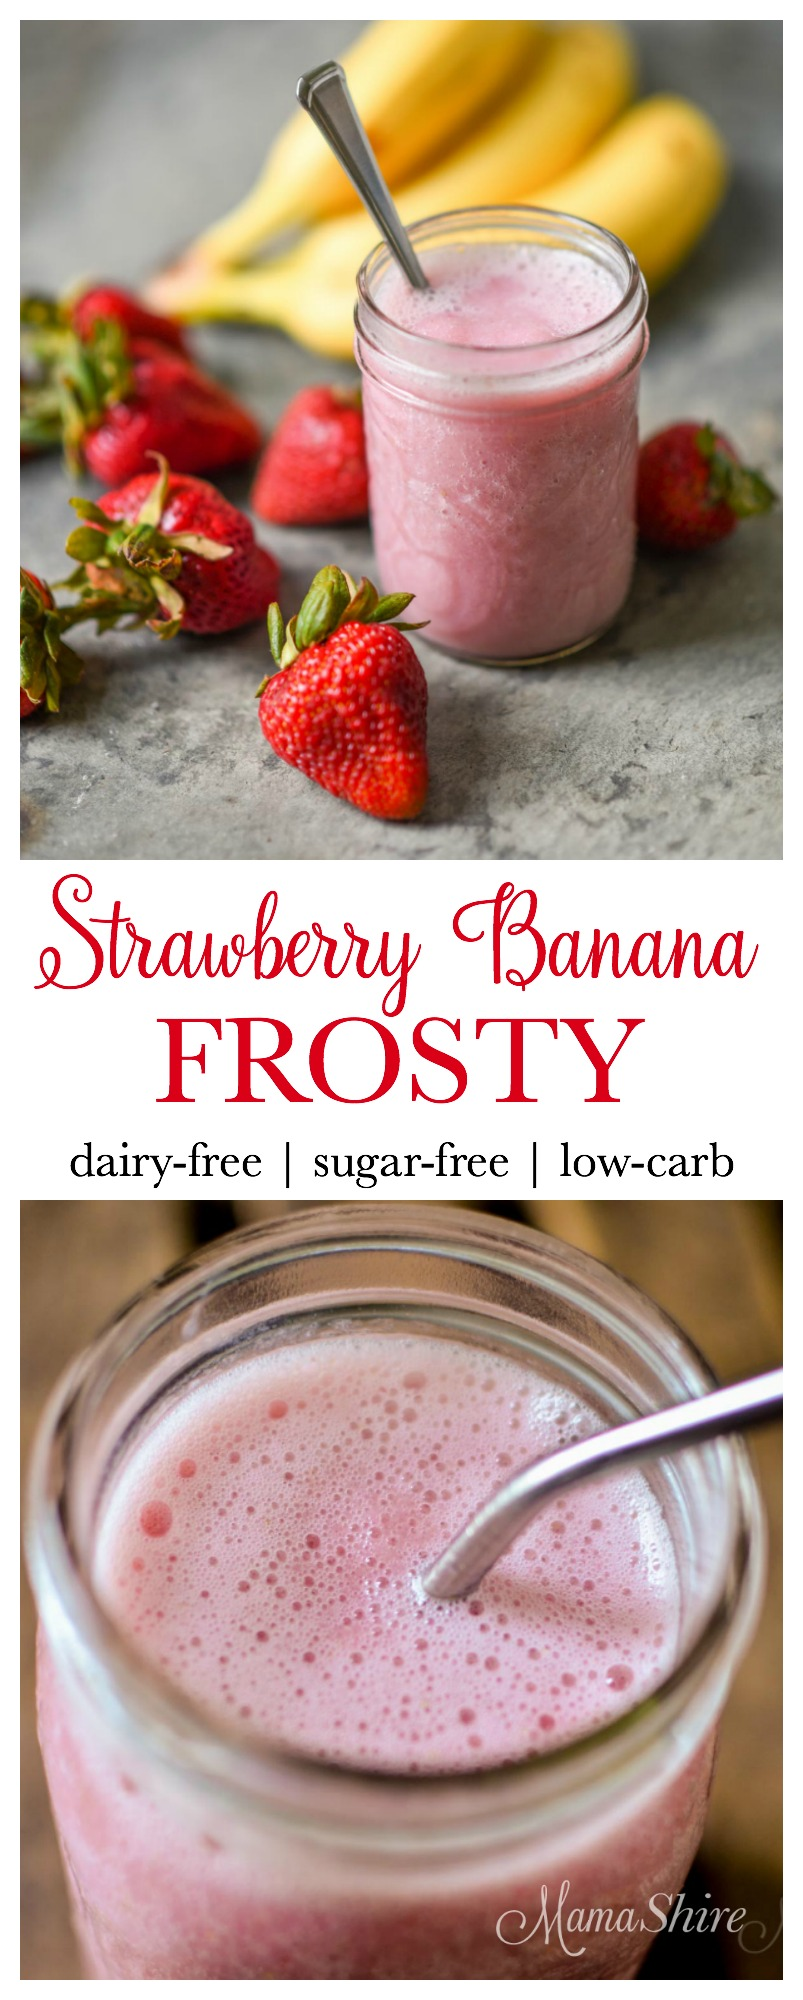 Strawberry Banana Frosty - dairy-free - sugar-free - low-carb